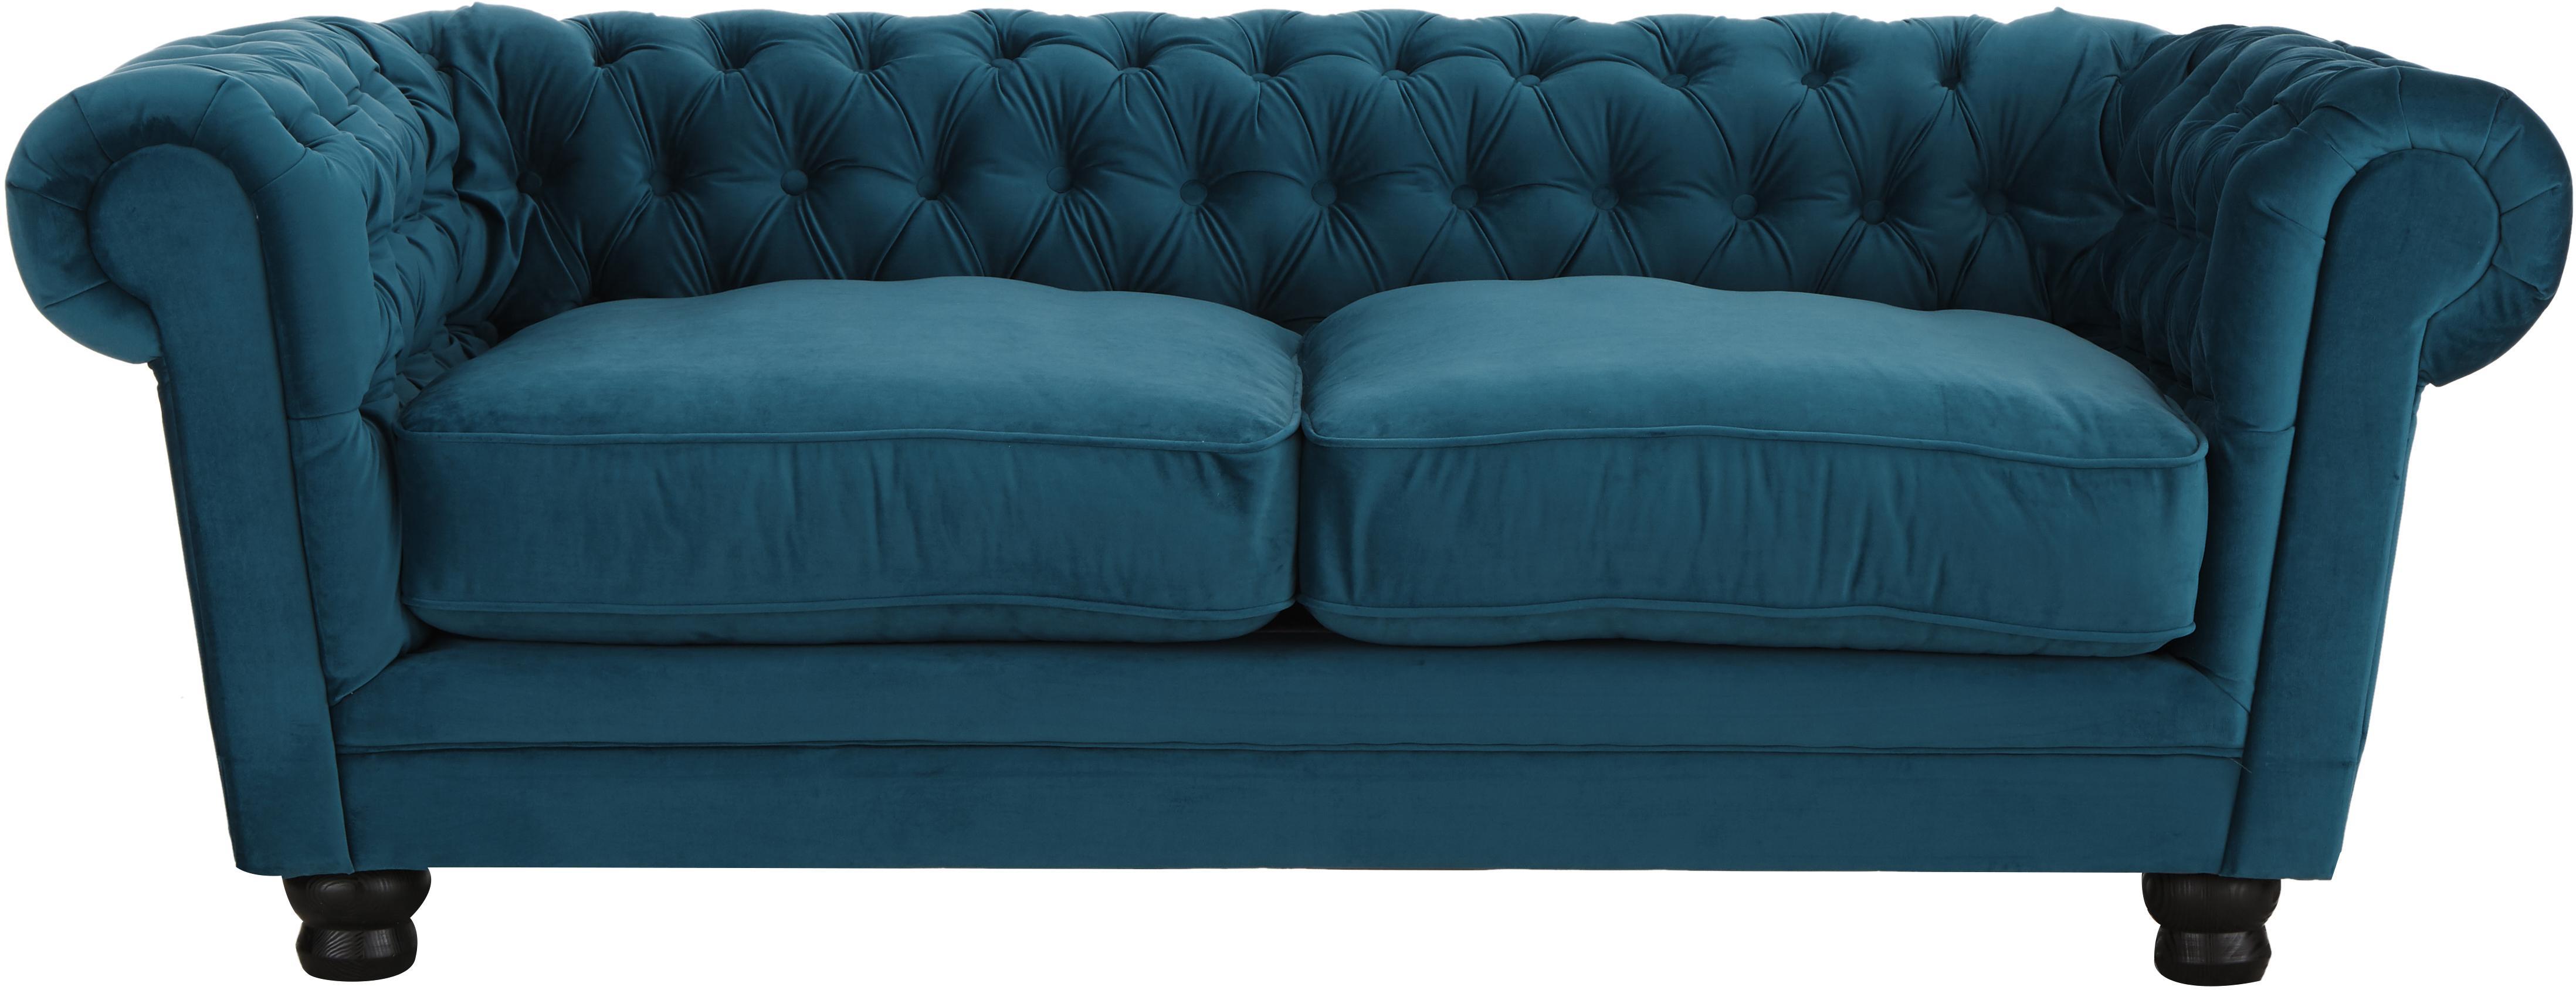 Chesterfield Samt-Sofa Sally (3-Sitzer), Bezug: 100% Polyester, Beine: Massivholz; Buche, lackie, Rahmen: Holzgrundgestell, Samt Petrol, 203 x 79 cm